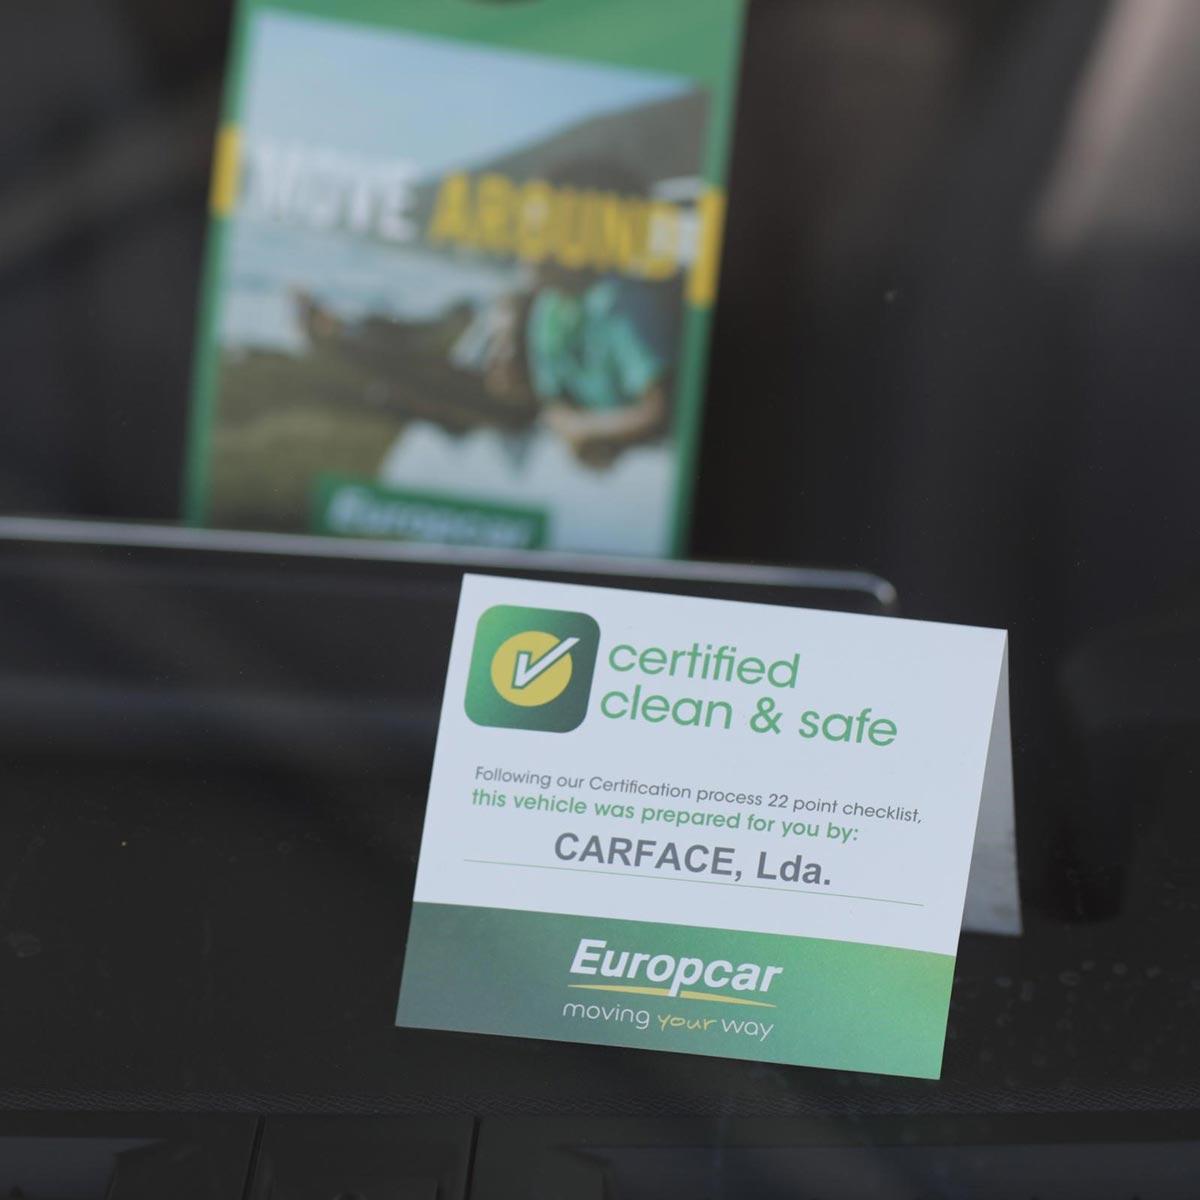 Europcar Abholung Mietwagen Clean & Safe